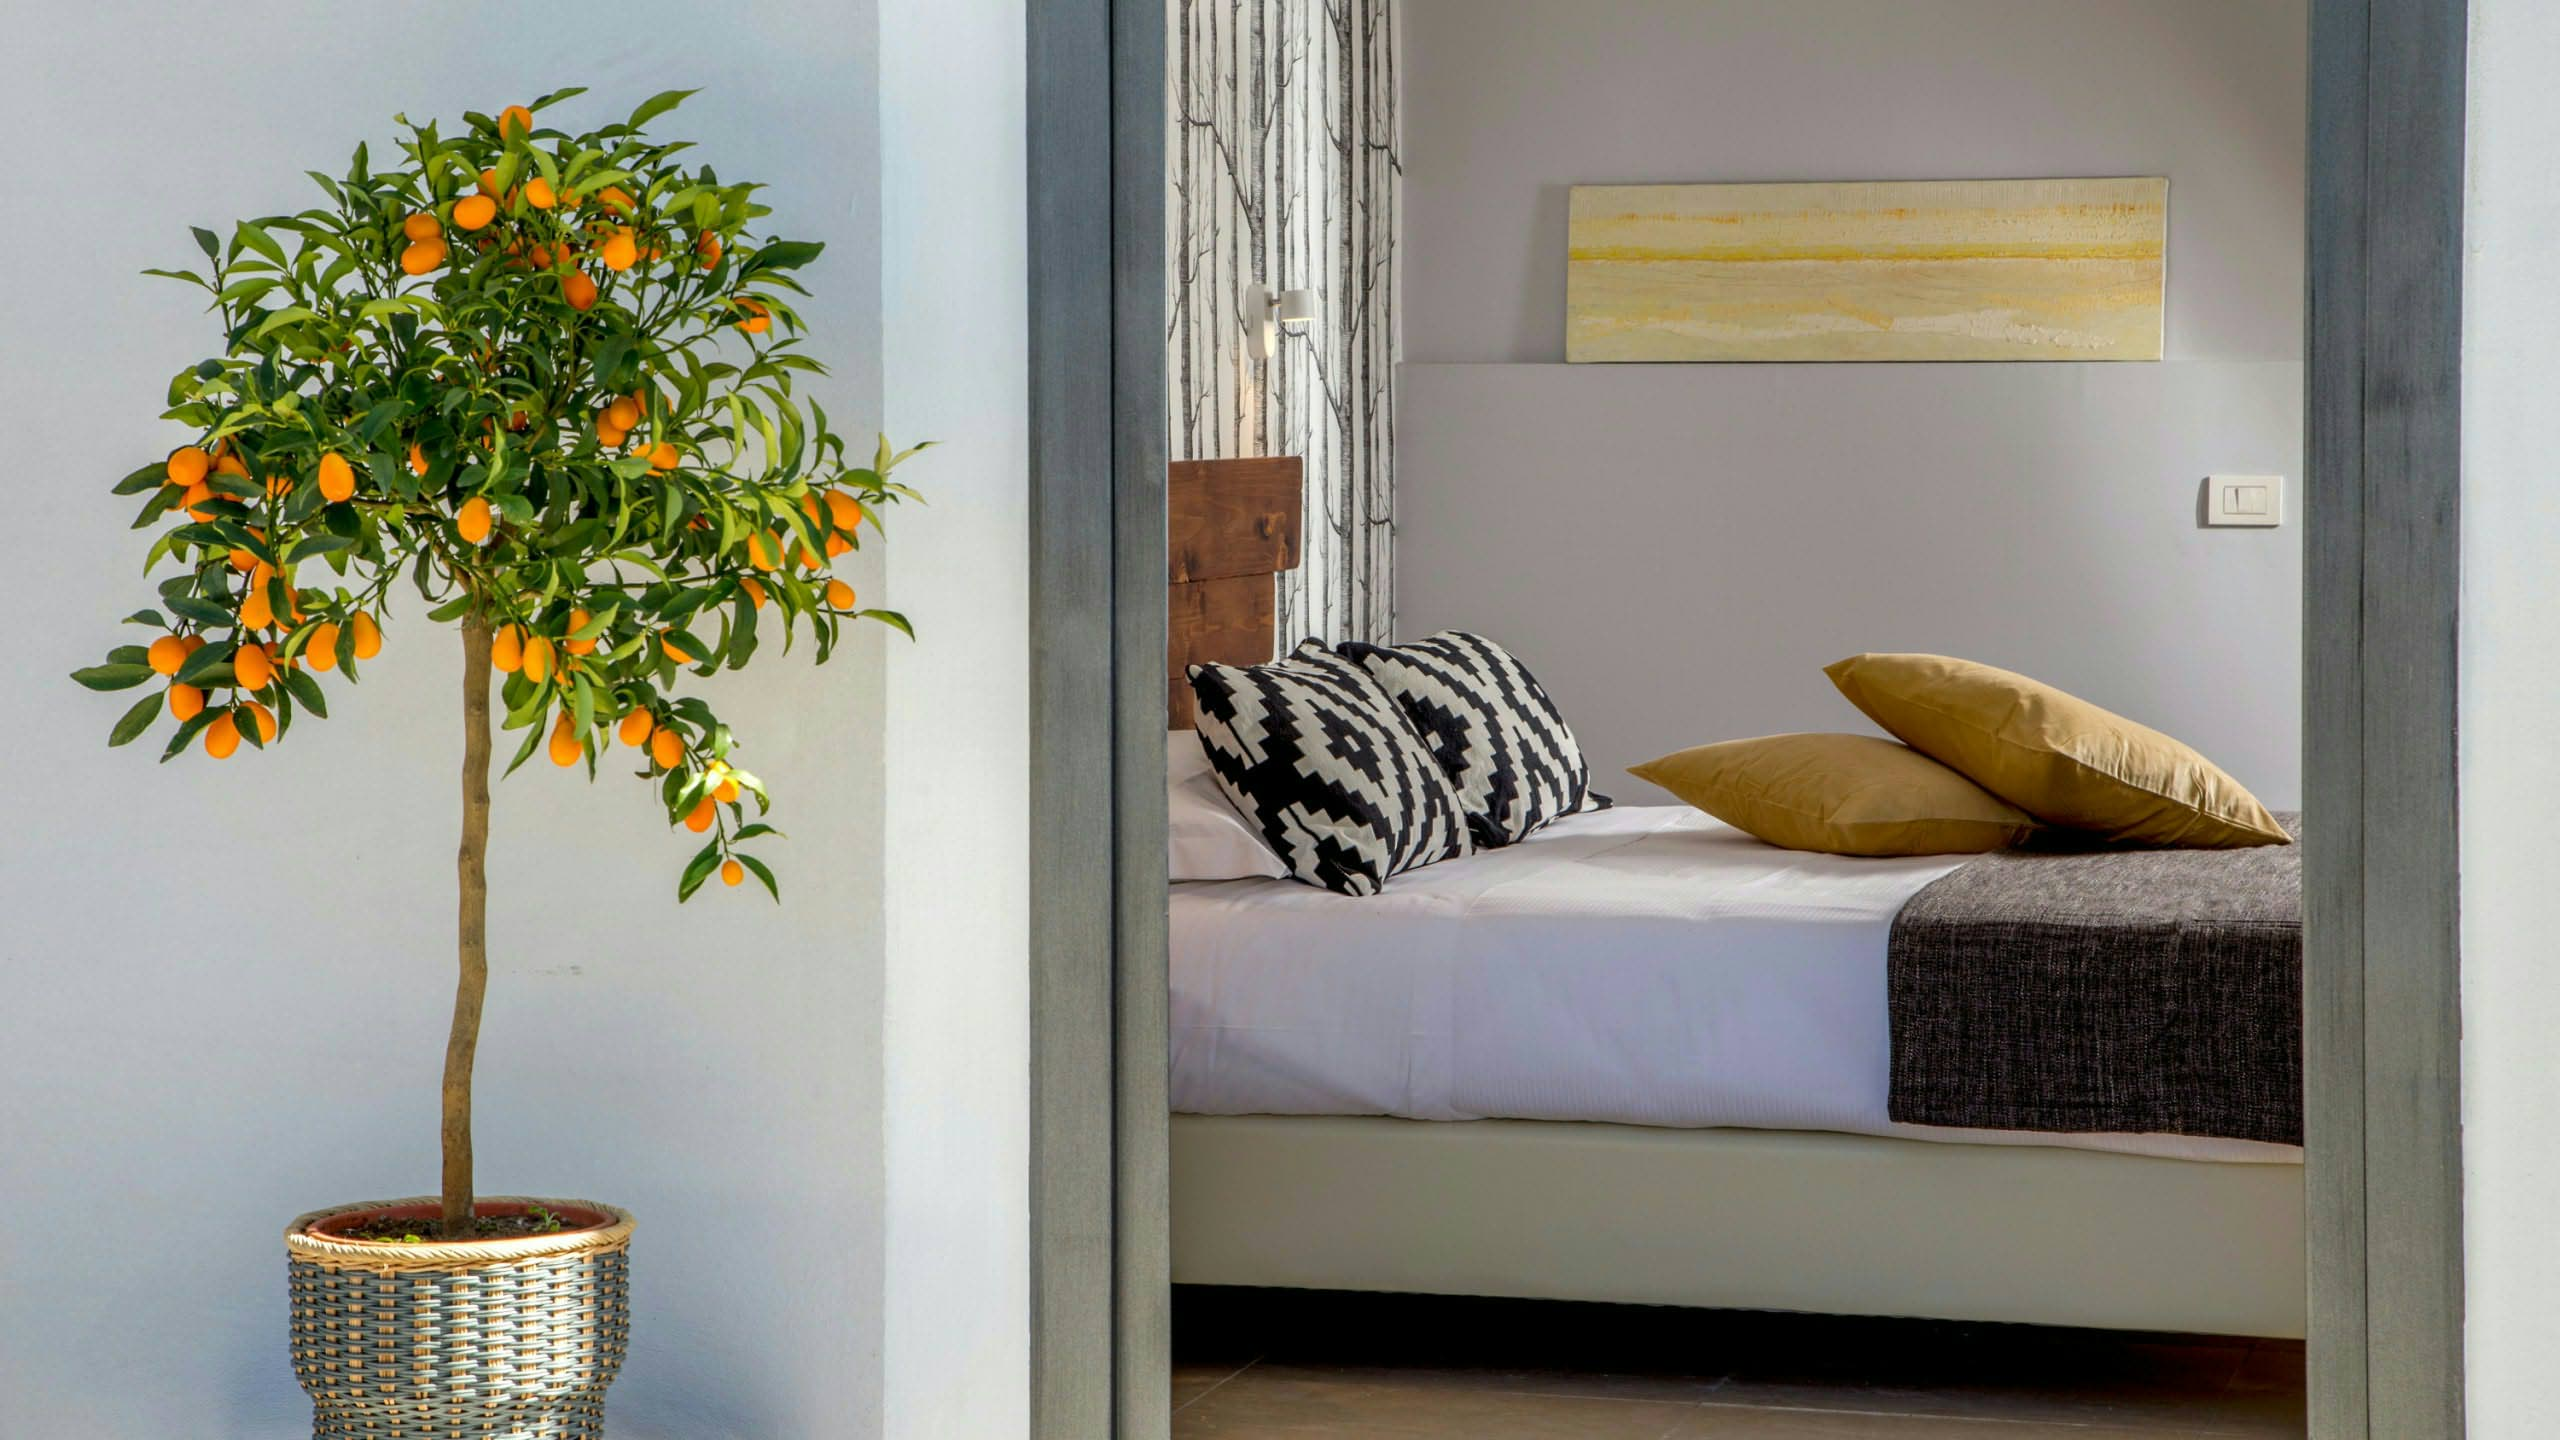 urbangarden-hotel-roma-camere-01